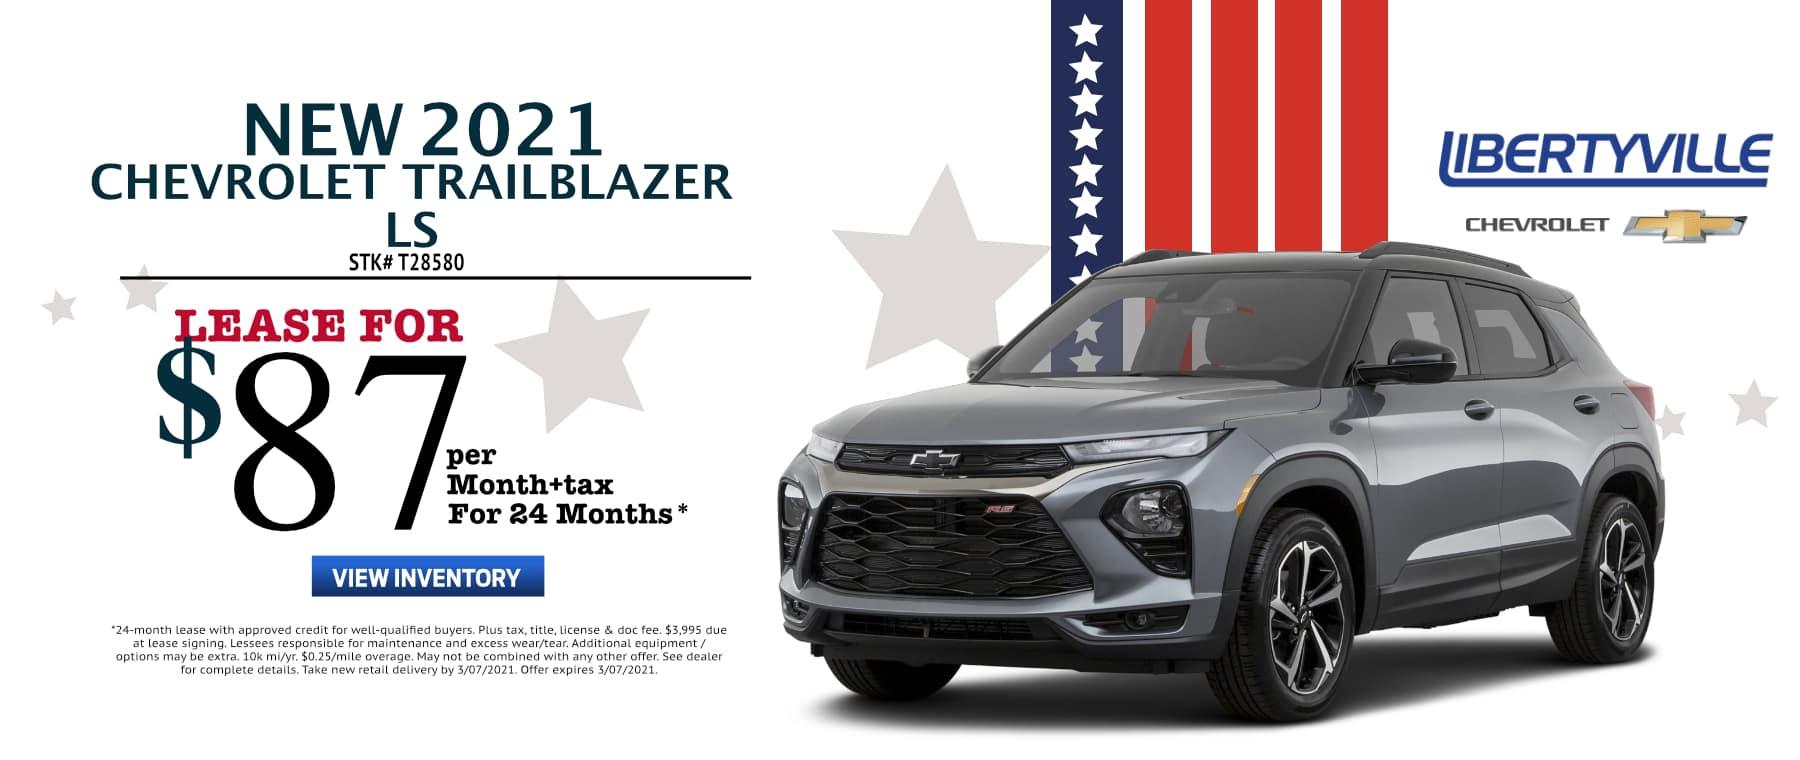 February_2021_Trailblazer_LEASE_Libertyville_Chevrolet